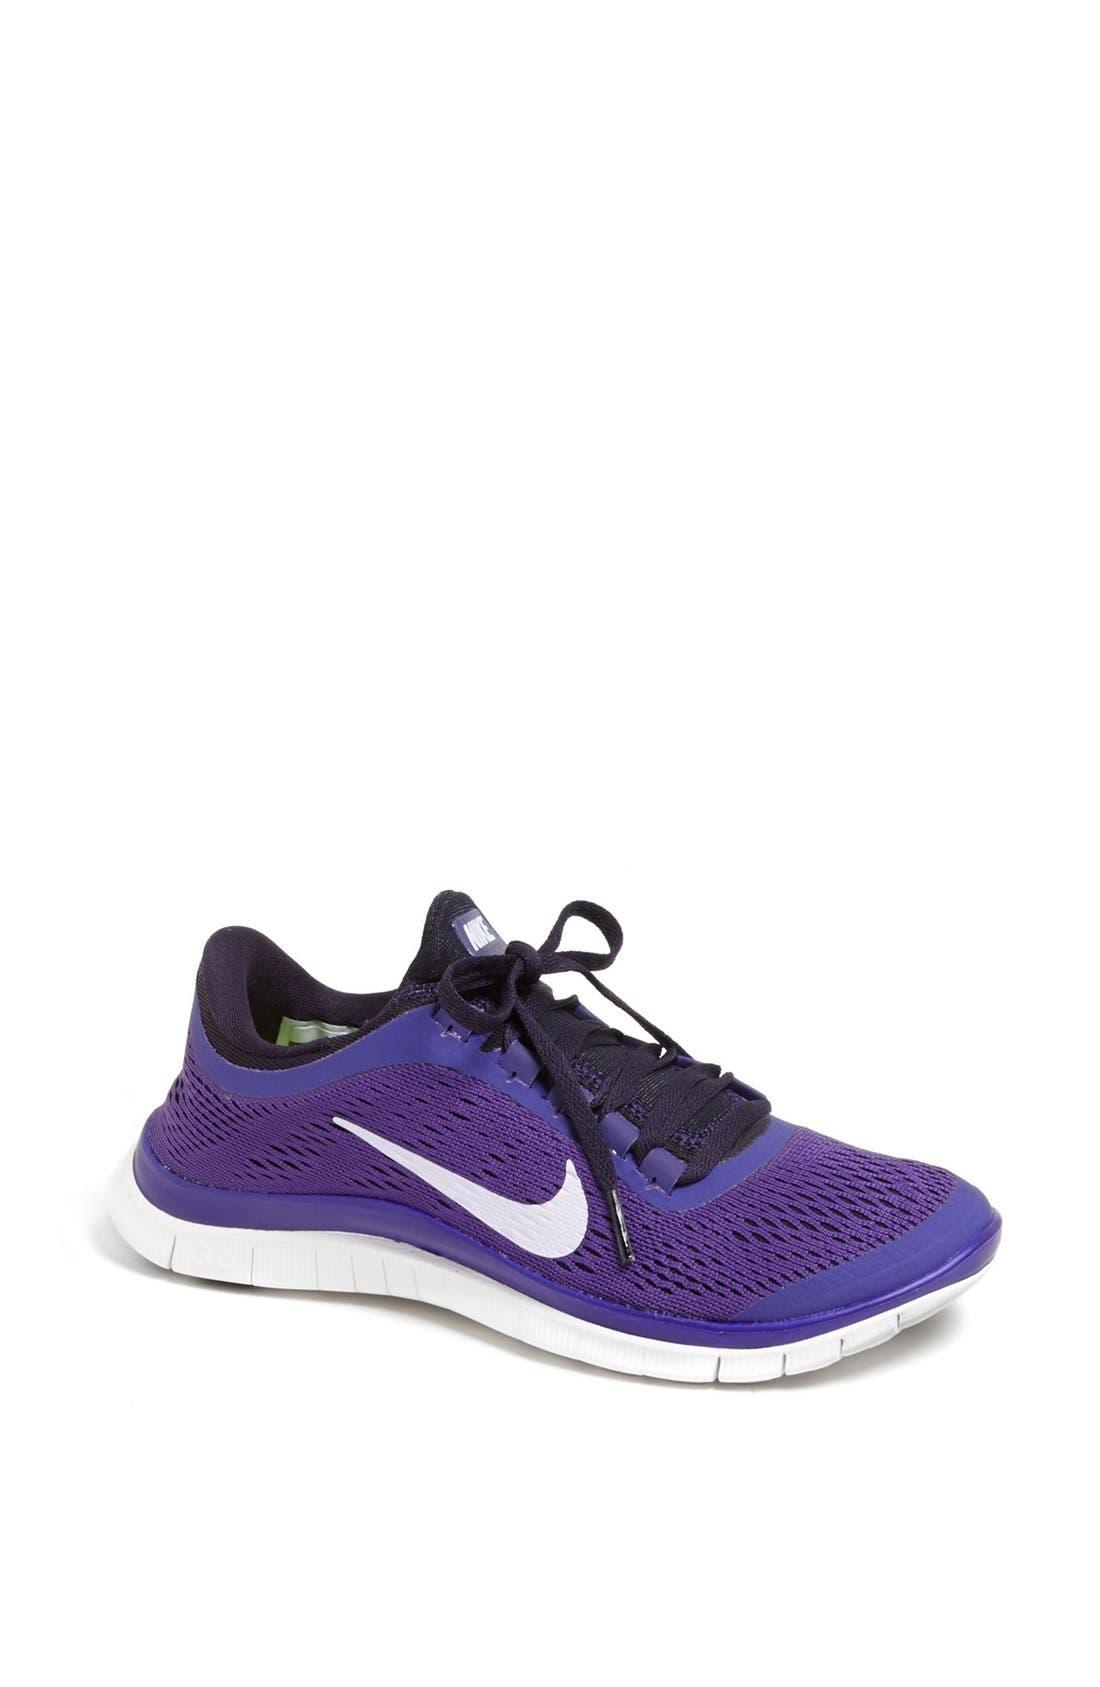 Main Image - Nike 'Free 3.0 v5' Running Shoe (Women)